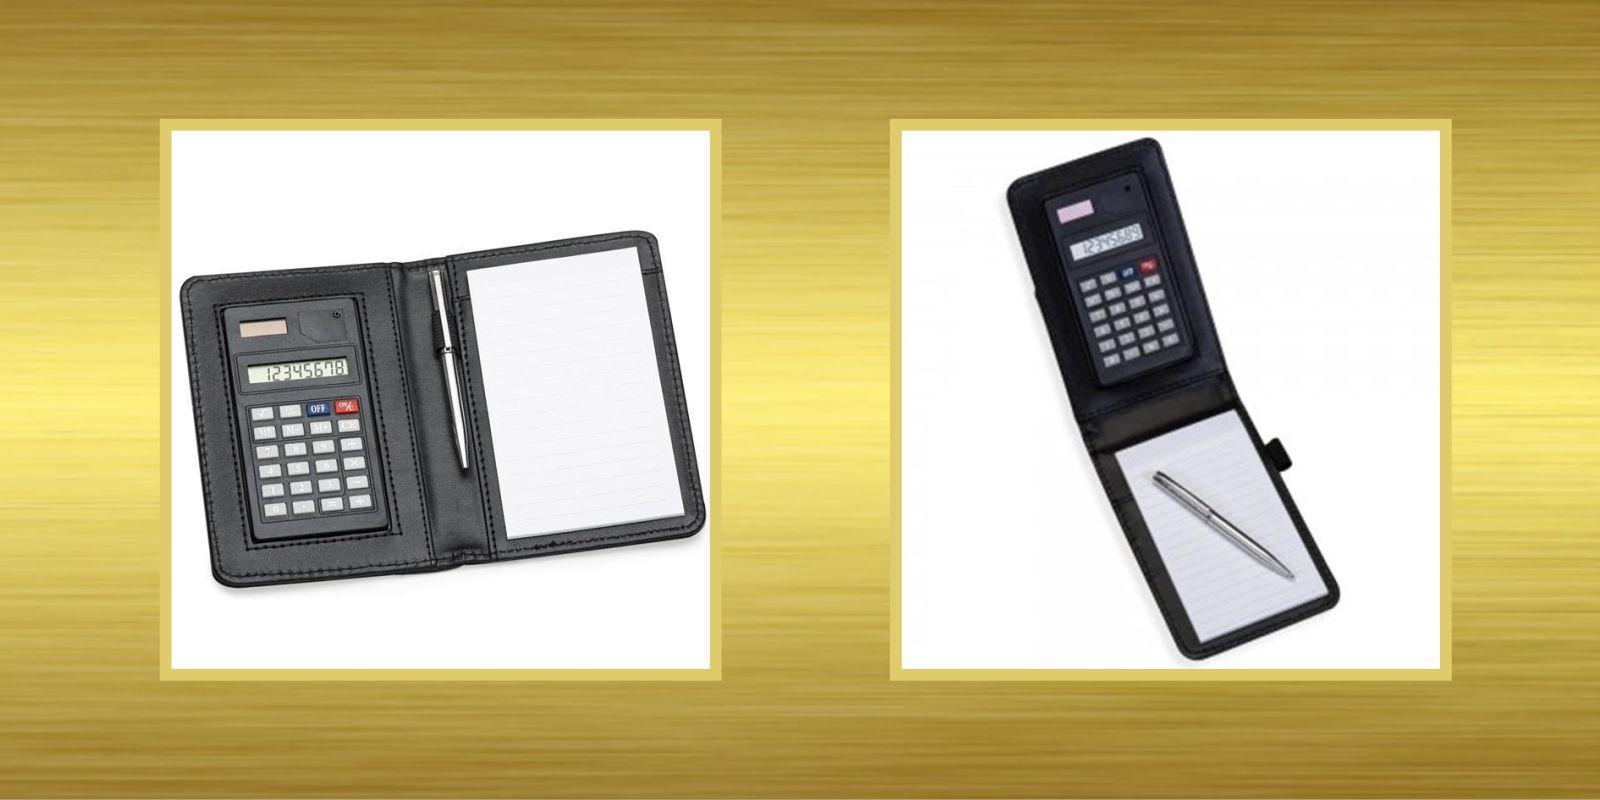 Bloco com Calculadora Personalizado